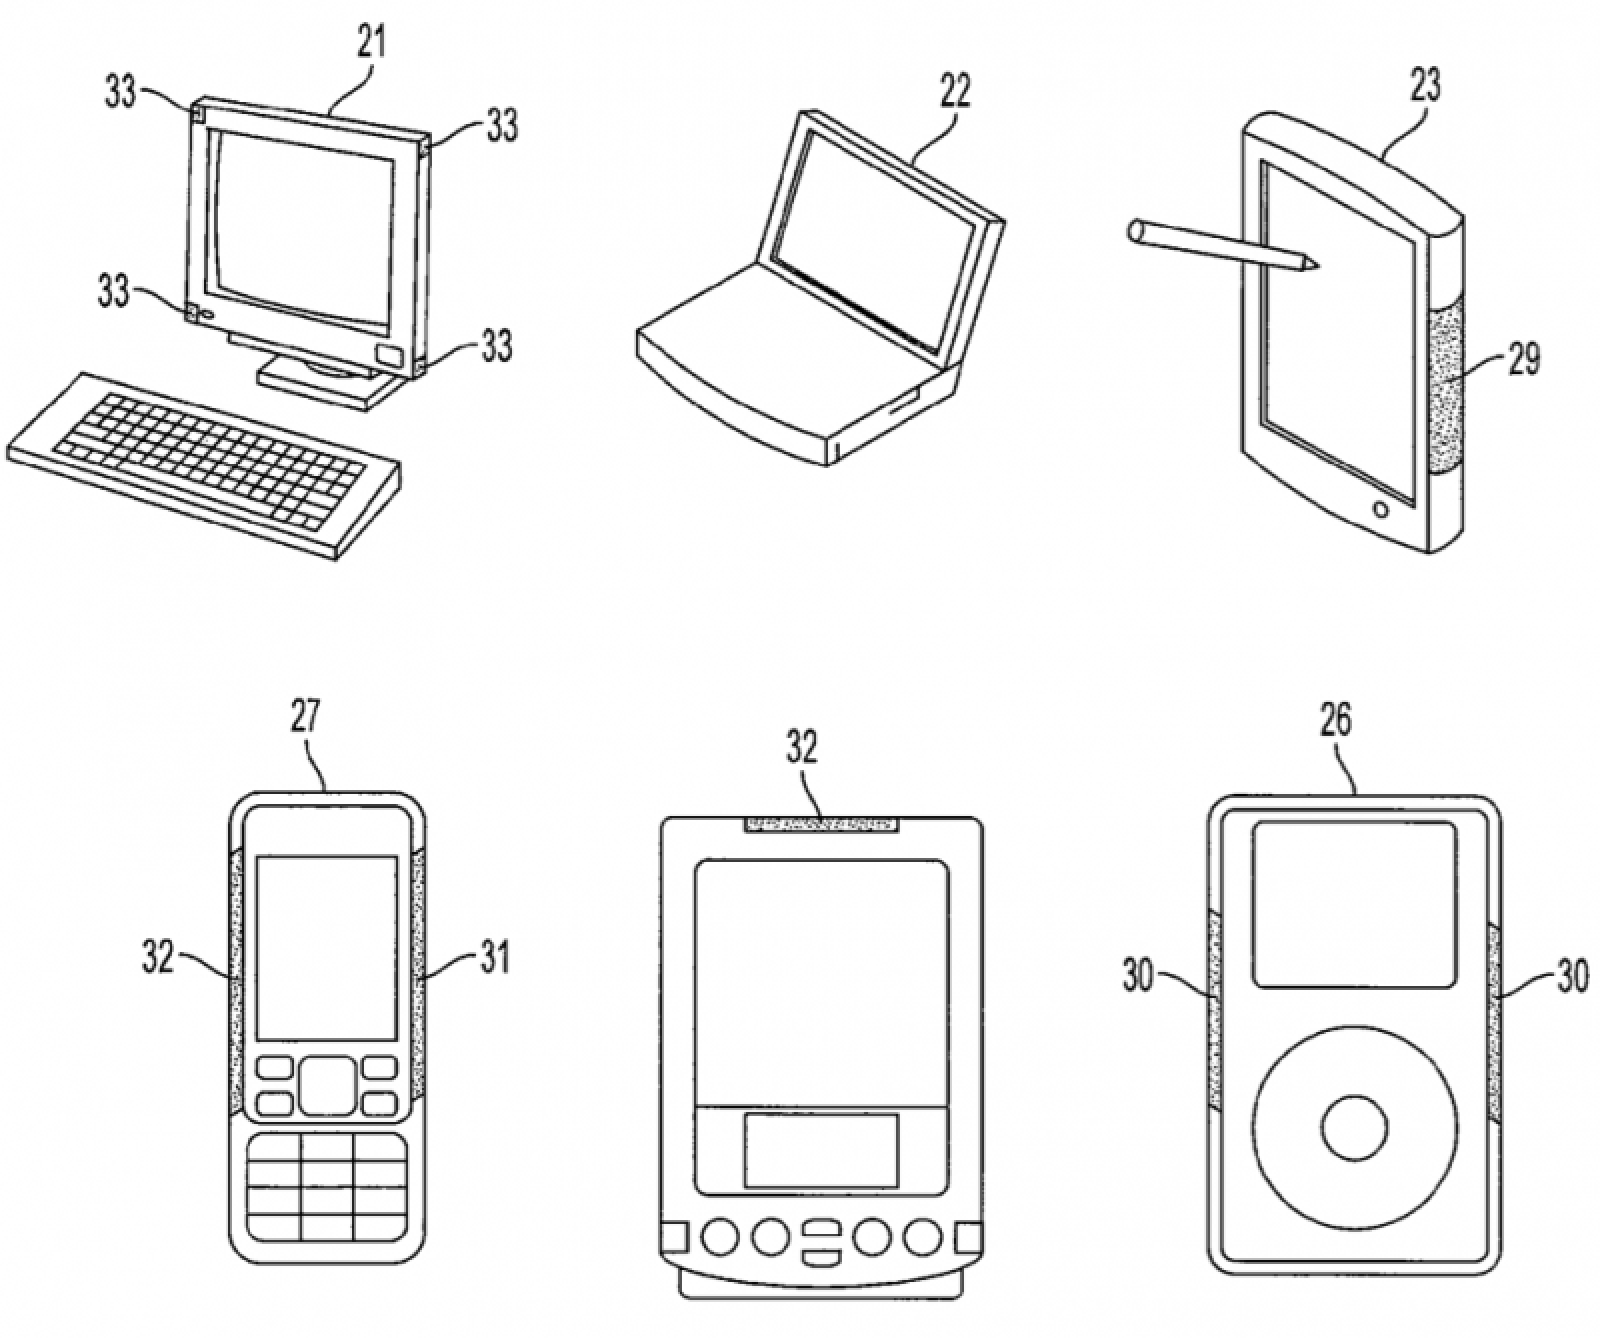 Apple Wins Patent for Pressure-Sensitive Device Casings